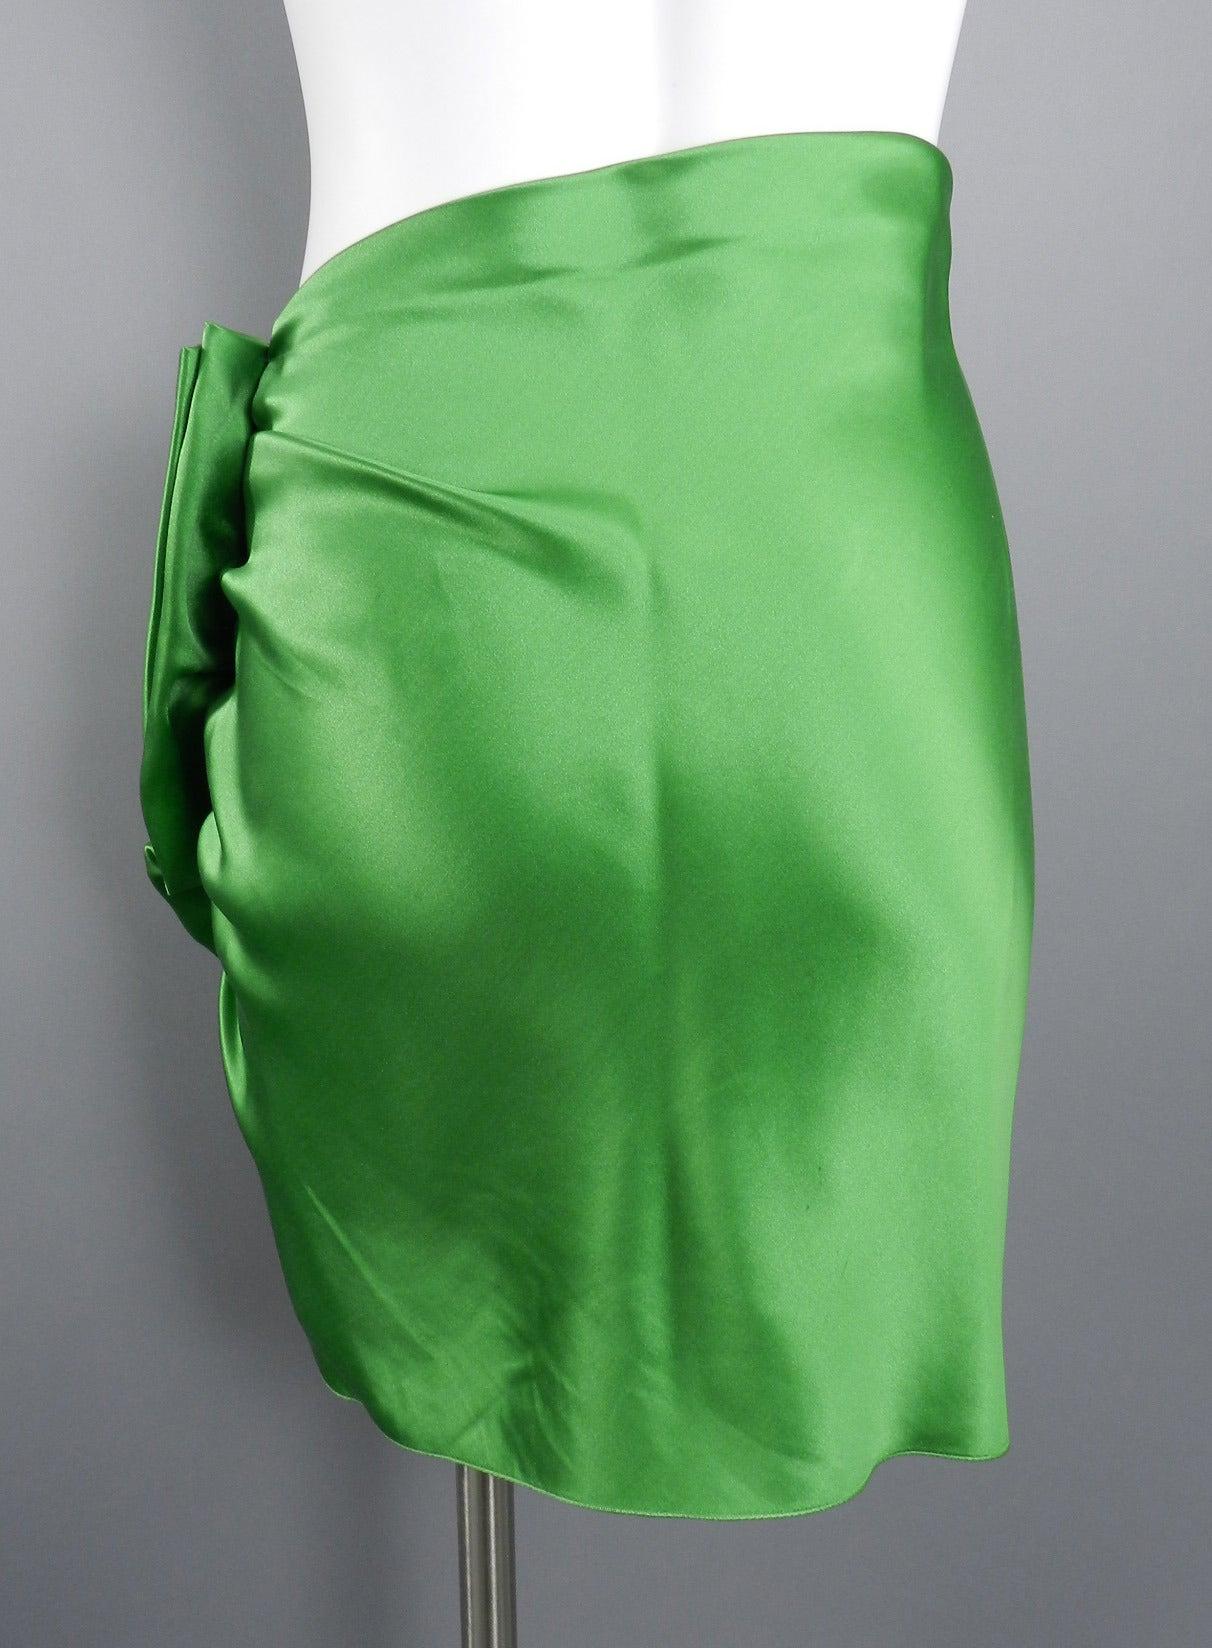 Lanvin 2009 Spring Runway Green Silk skirt 5